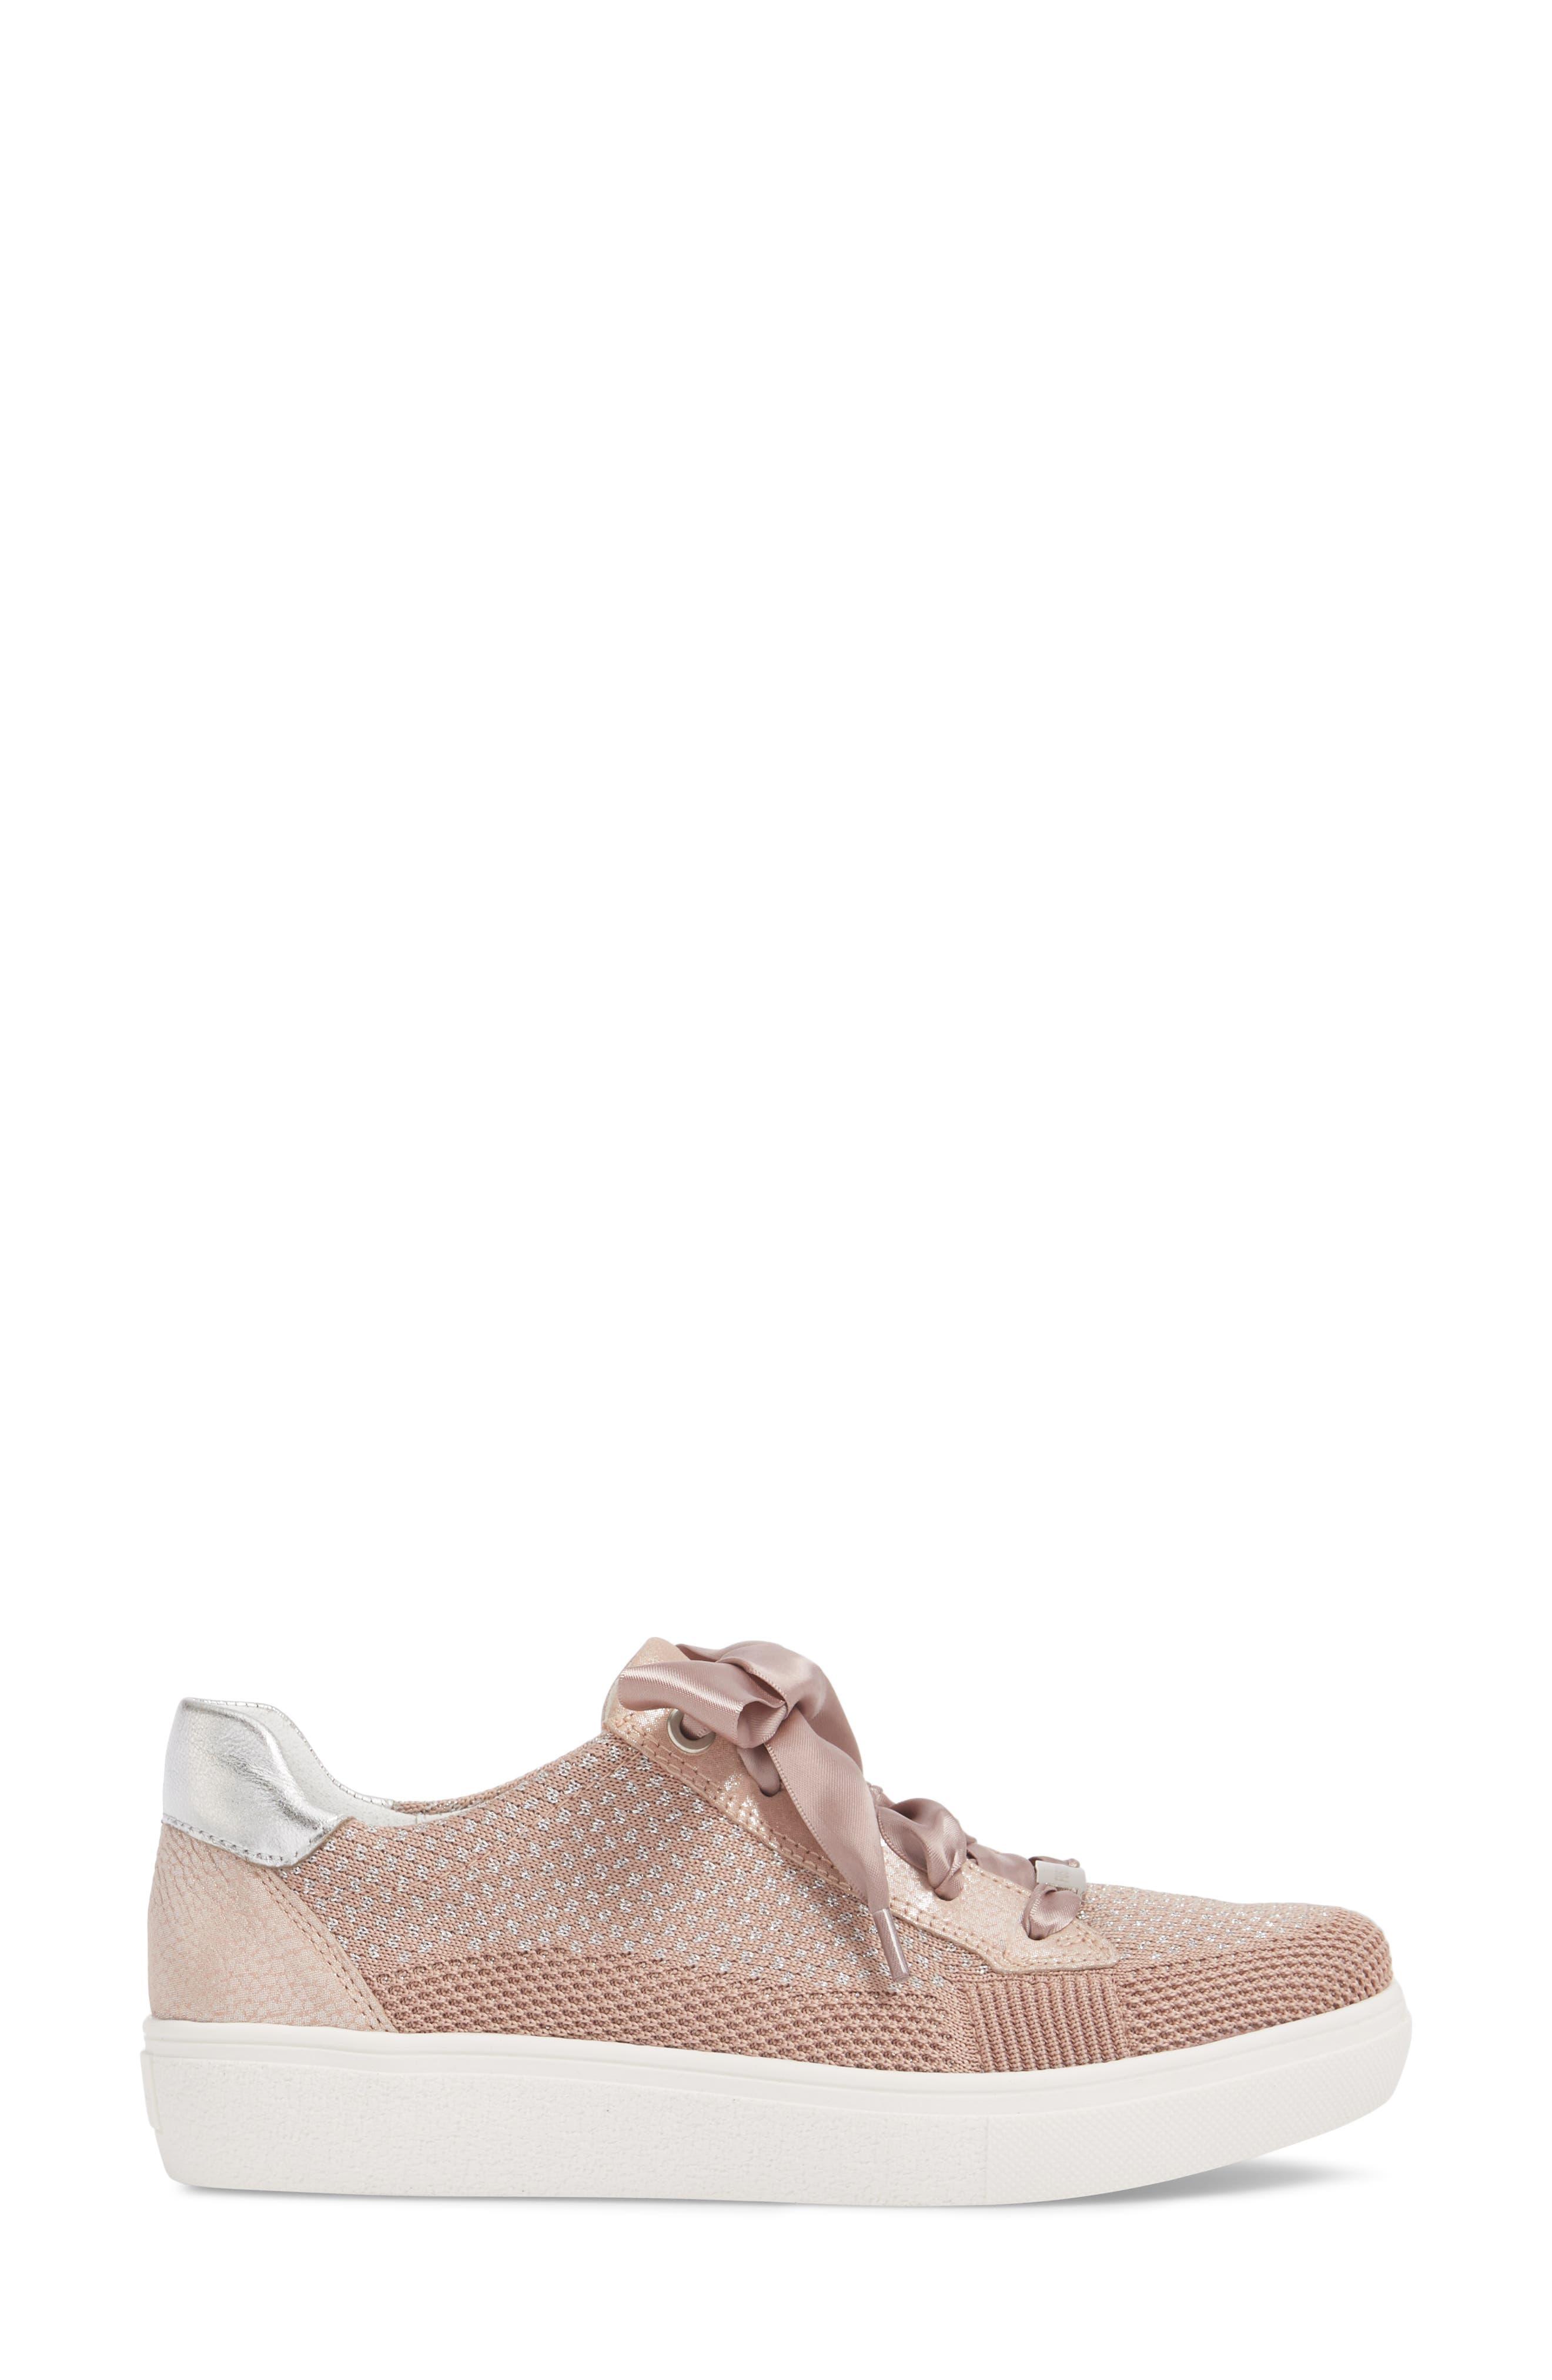 Natalya Sneaker,                             Alternate thumbnail 3, color,                             Powder Fabric